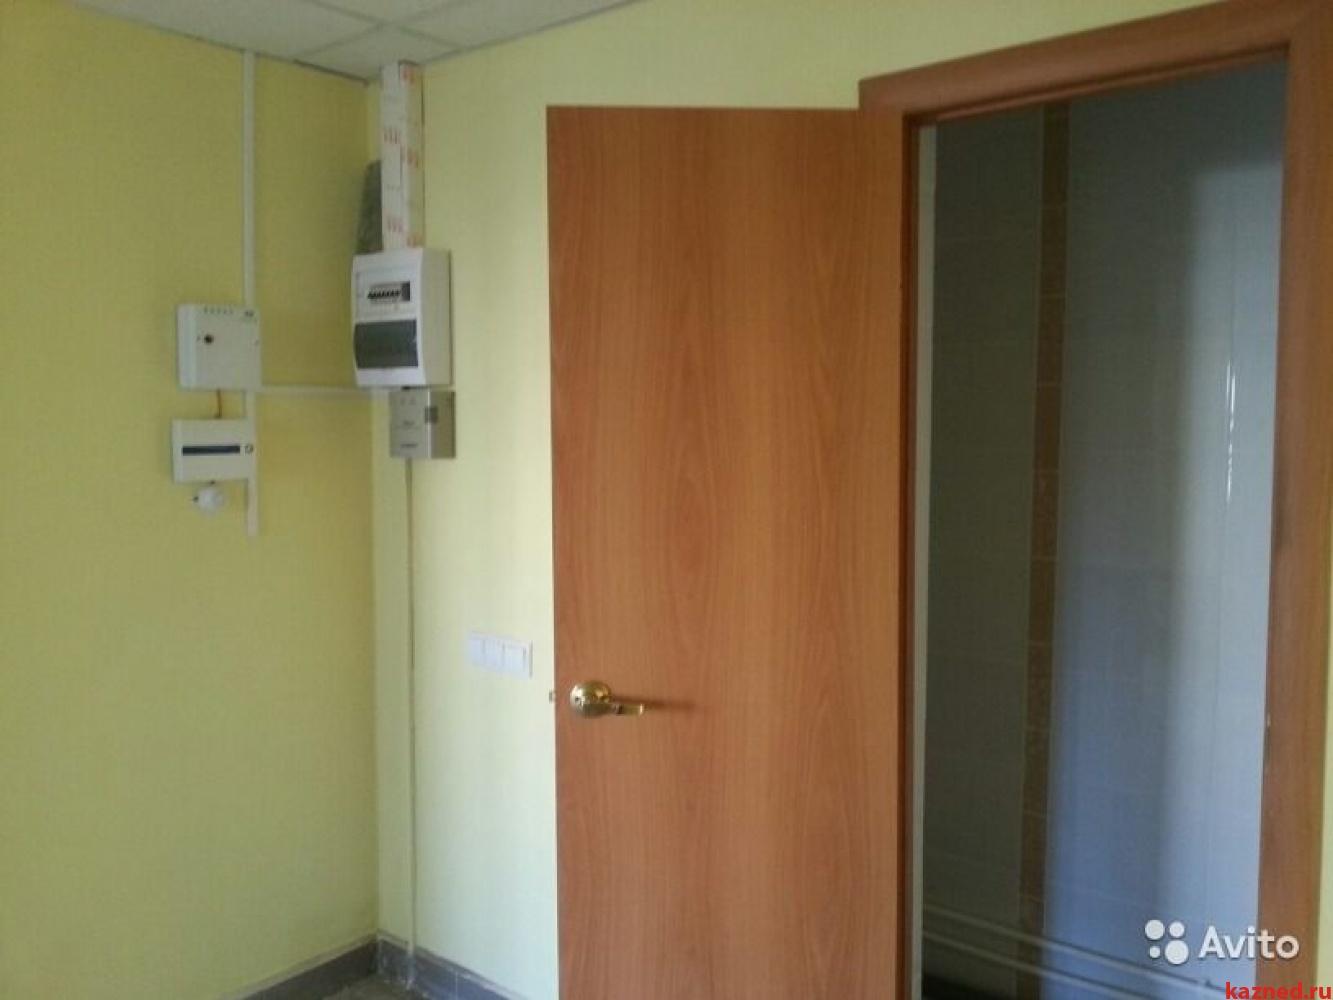 Продажа  помещения свободного назначения Академика Сахарова, 10, 74 м2  (миниатюра №8)